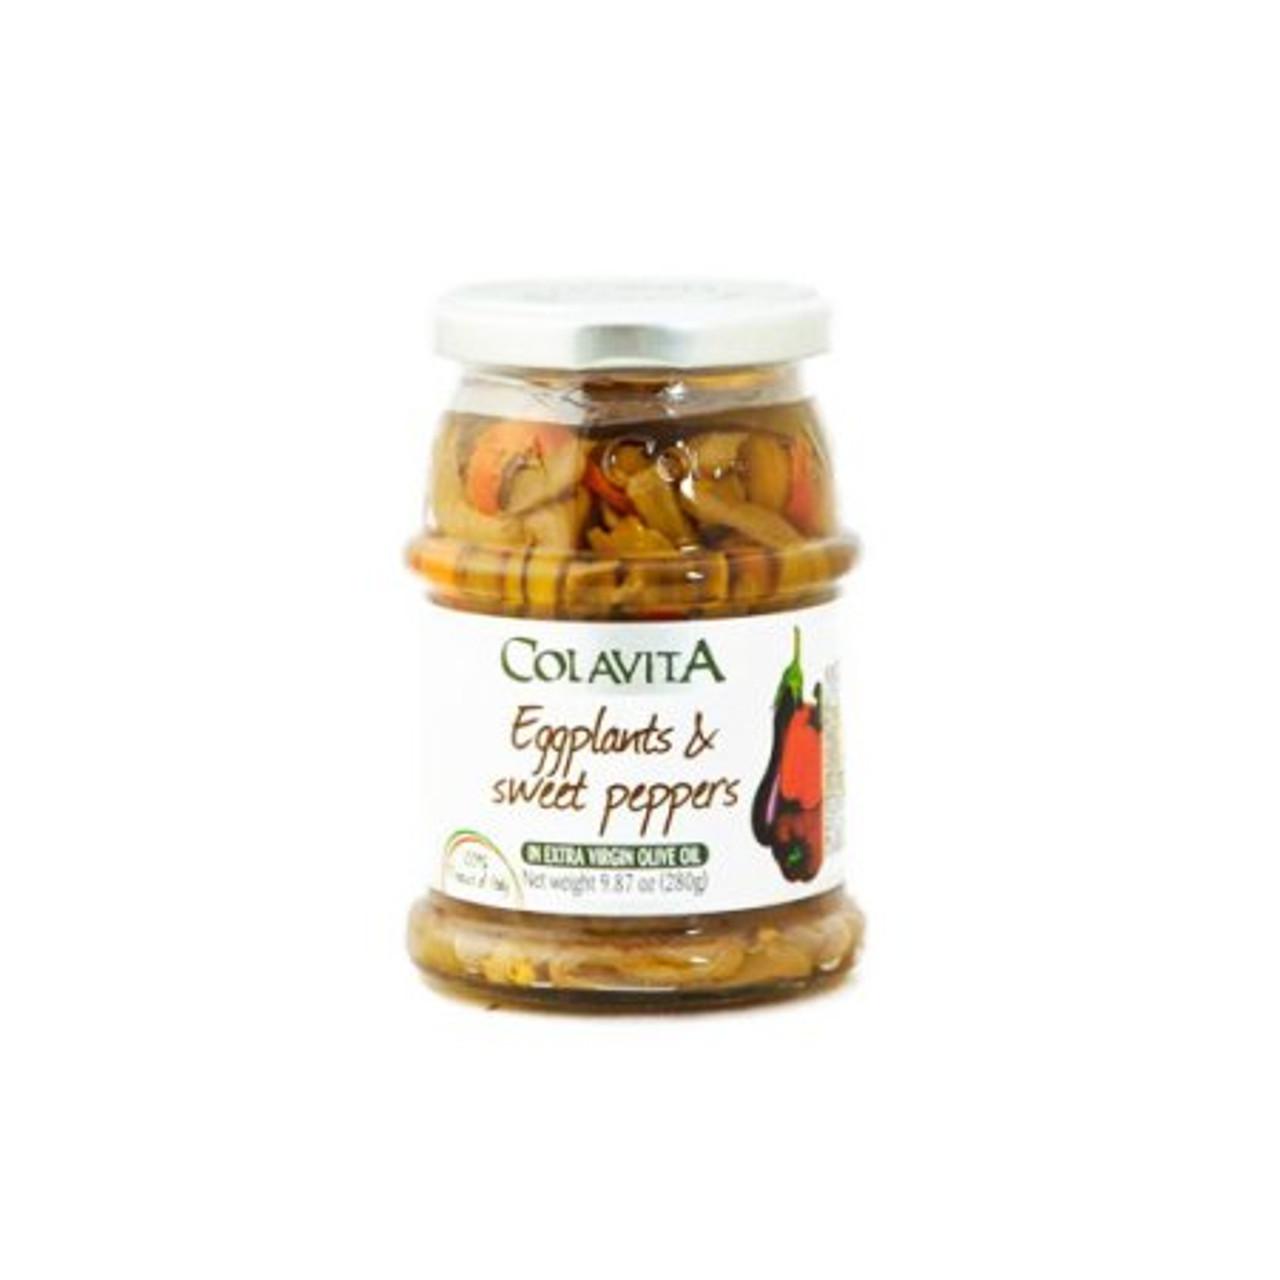 Colavtia Eggplant & Sweet Peppers